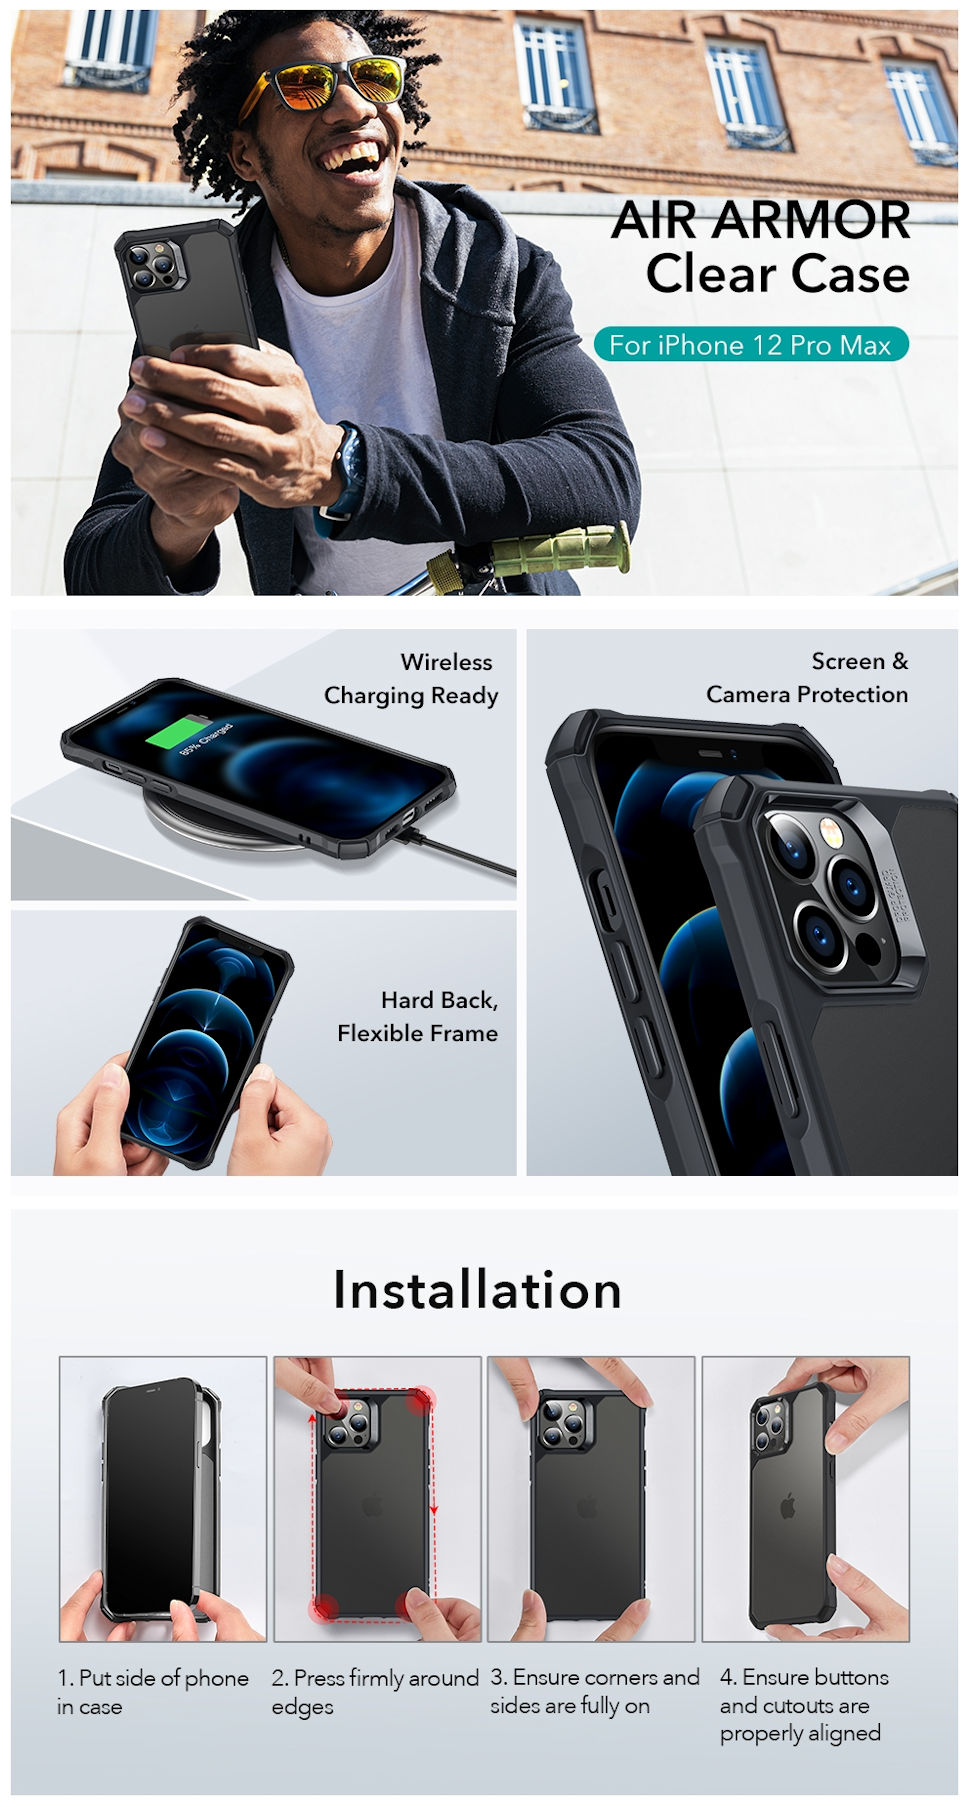 Gohub Shop - ESR Air Armor - Black case for iPhone 12 Pro Max